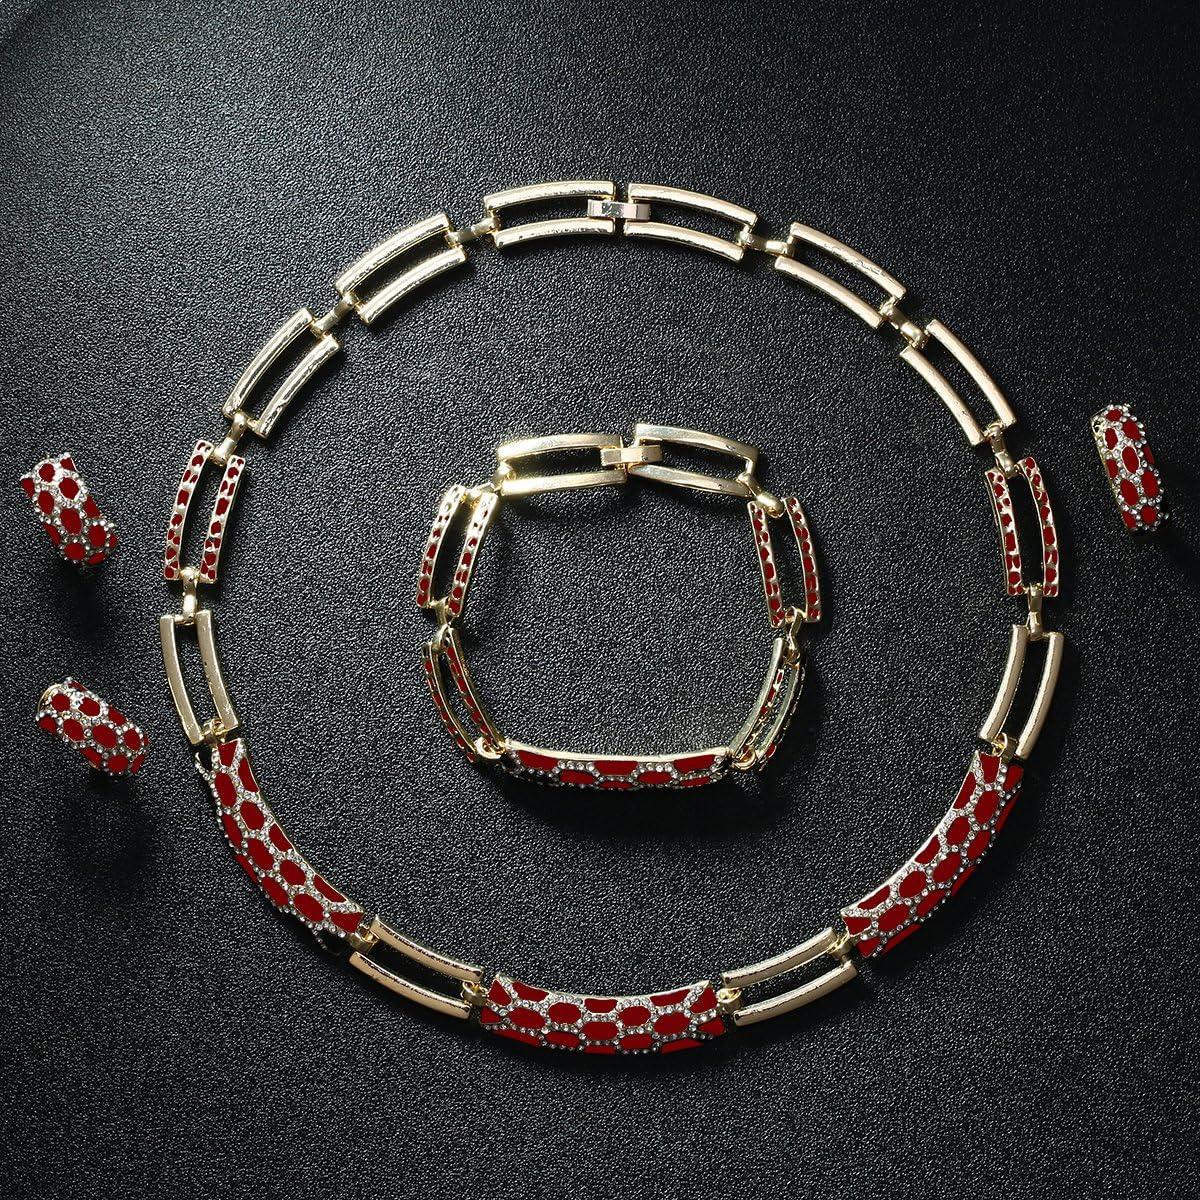 IFFURMON Fine Jewelry Sets Wedding 18K Gold Plated For Women Dress Accessories